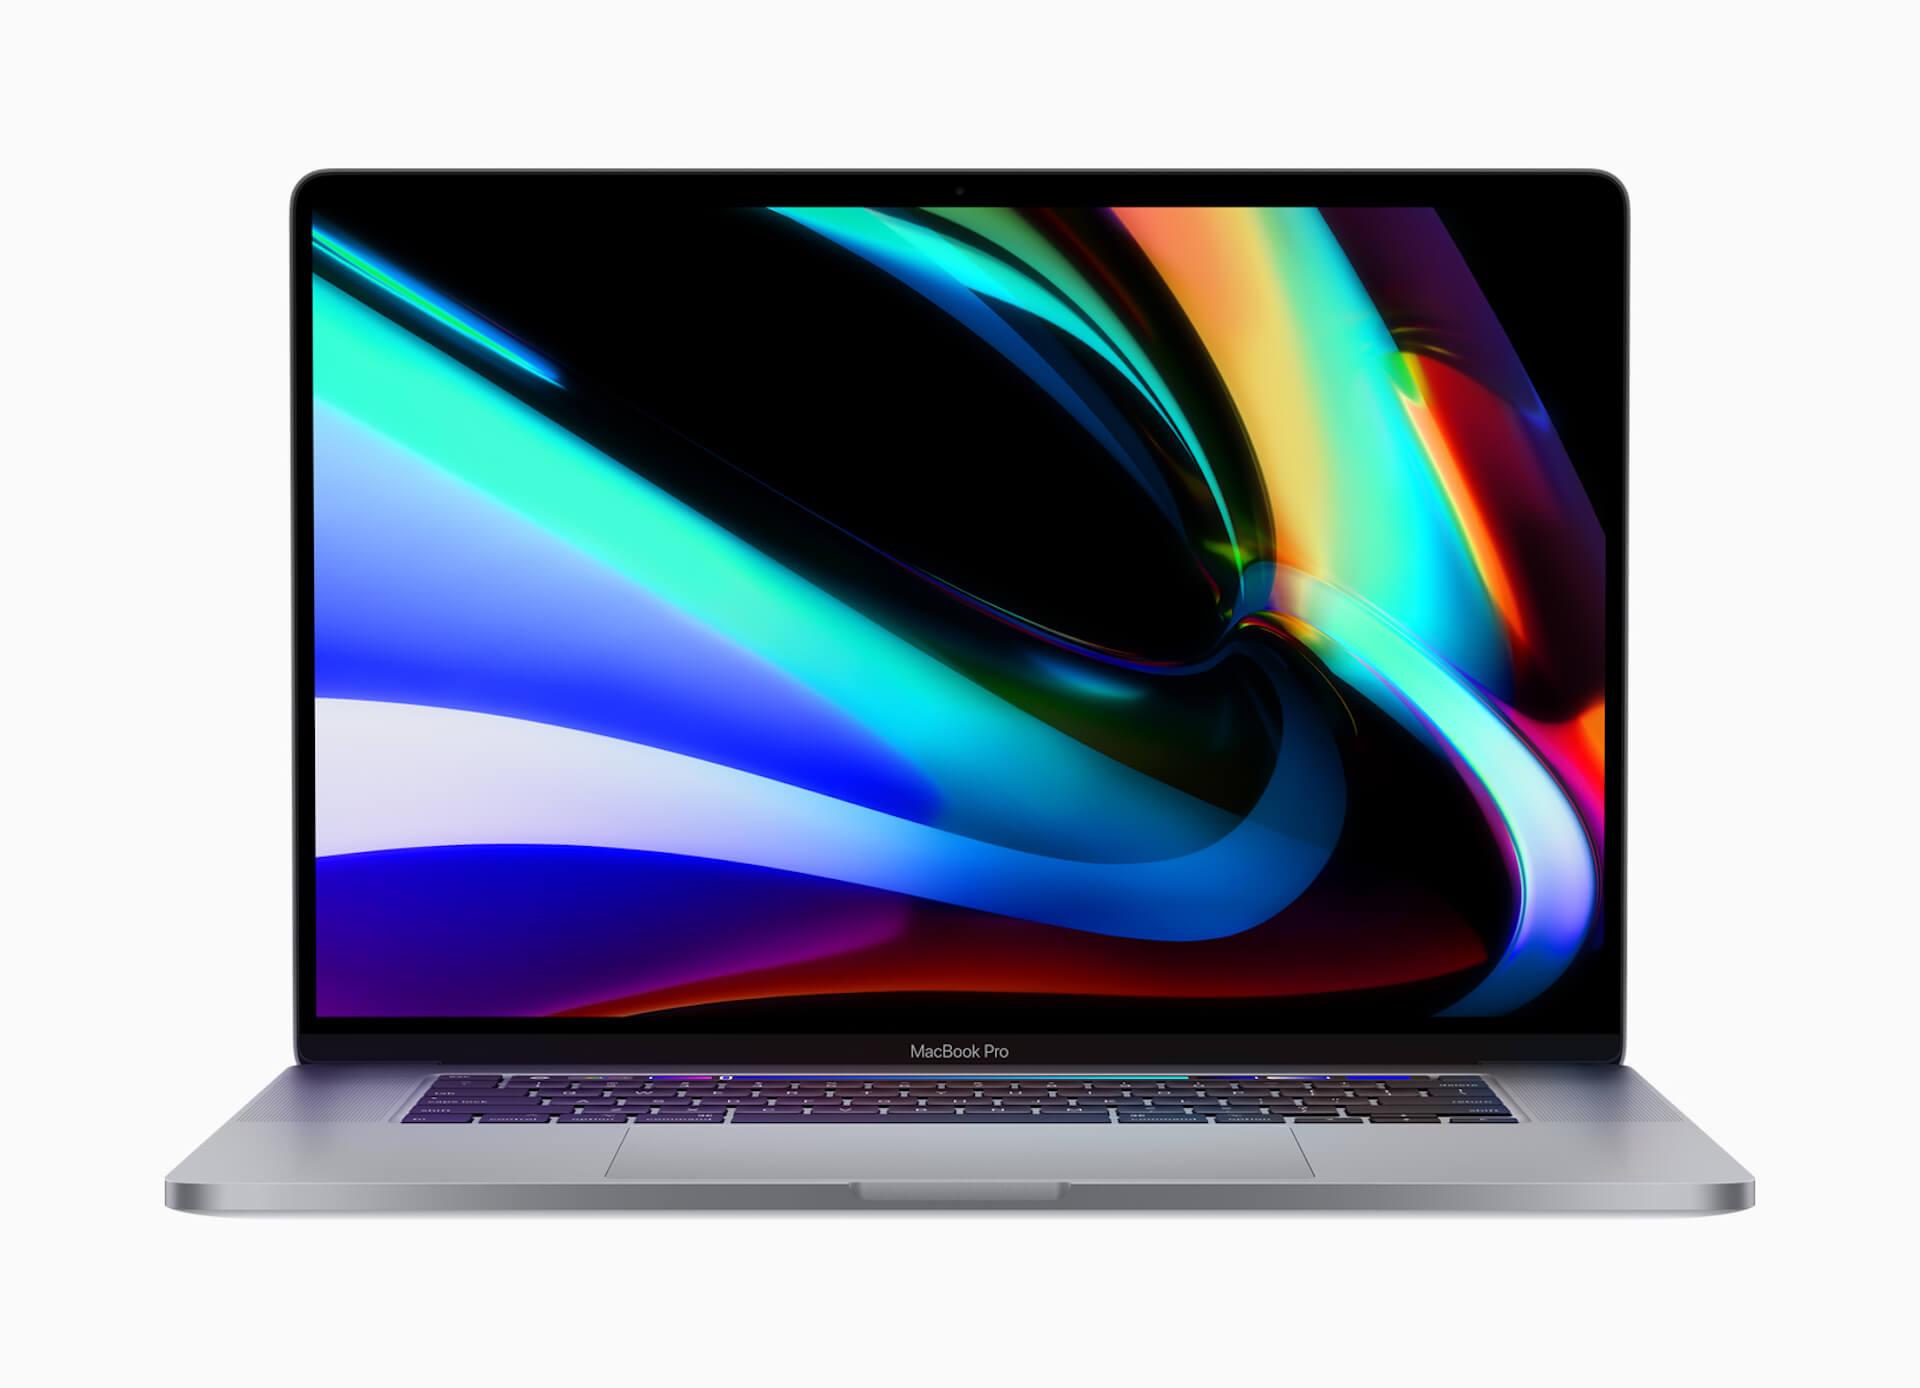 Apple、MacBookのタッチスクリーン化を検討か|タッチスクリーンの特許申請が発覚 tech200117_macbook_screen_main